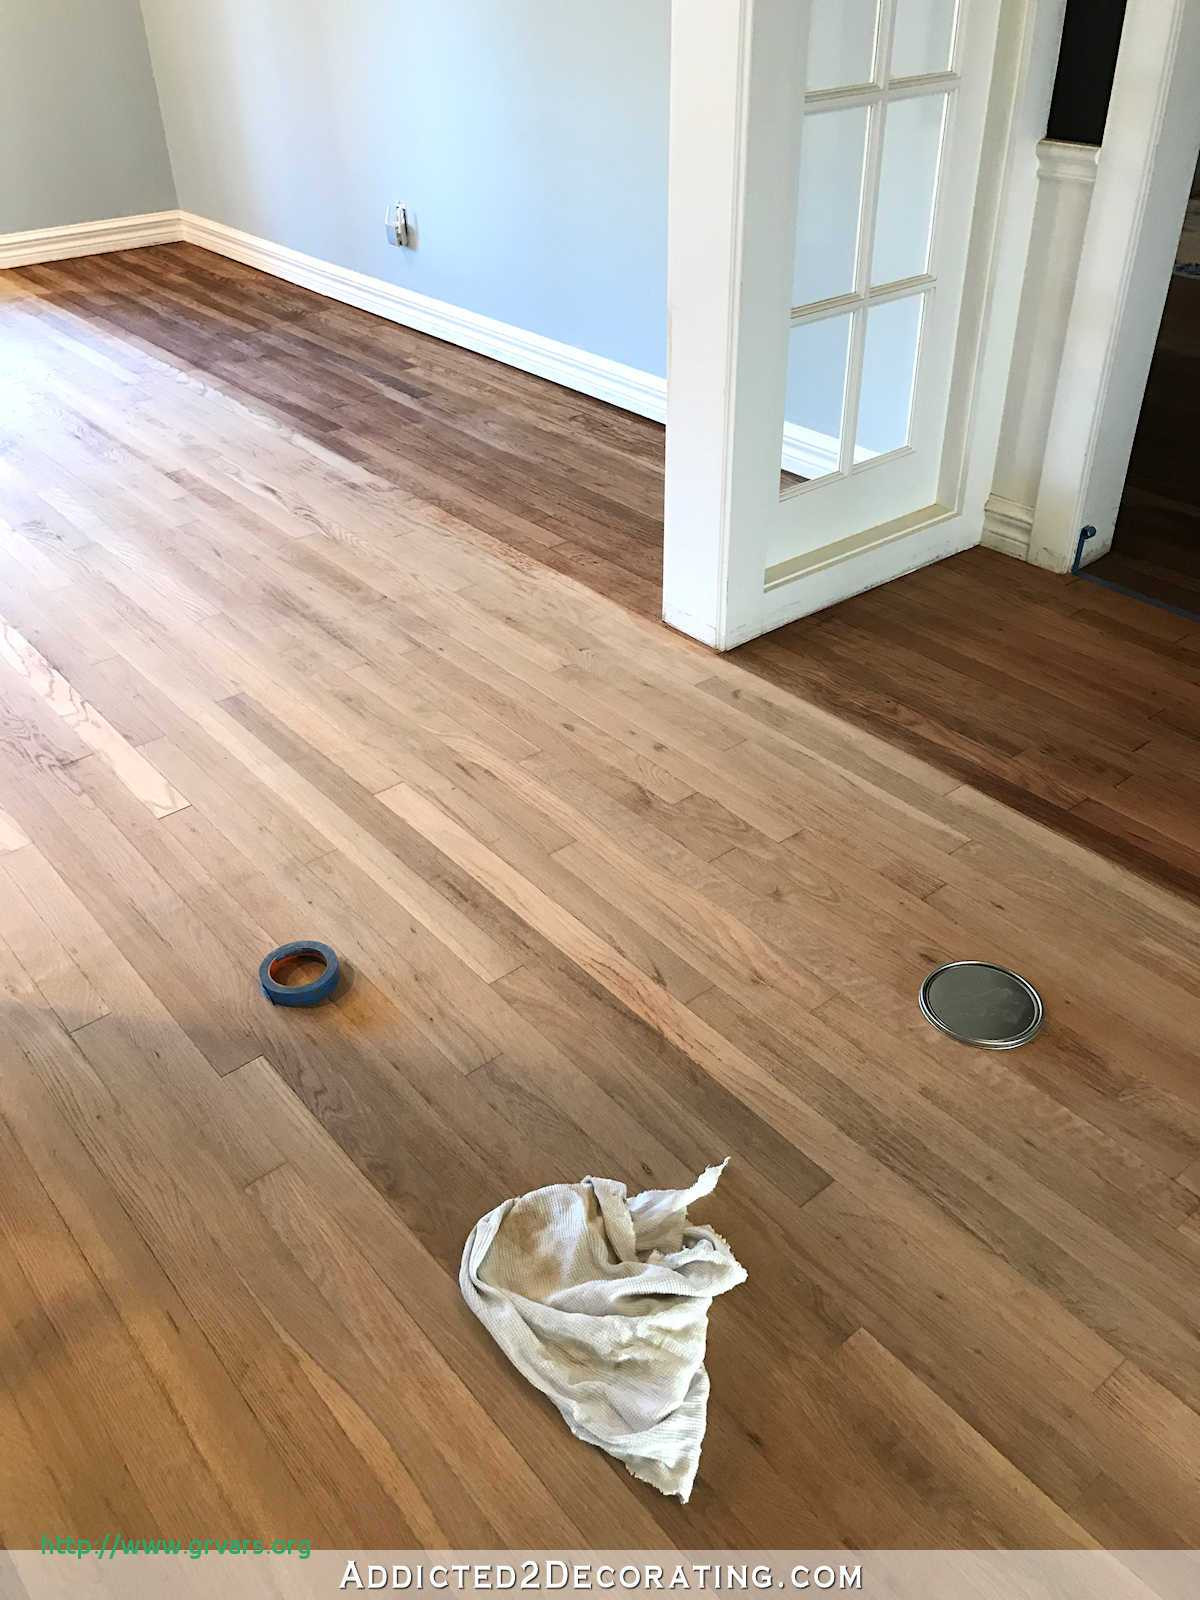 hardwood flooring 101 of 17 charmant fix hardwood floor finish ideas blog throughout fix hardwood floor finish nouveau adventures in staining my red oak hardwood floors products